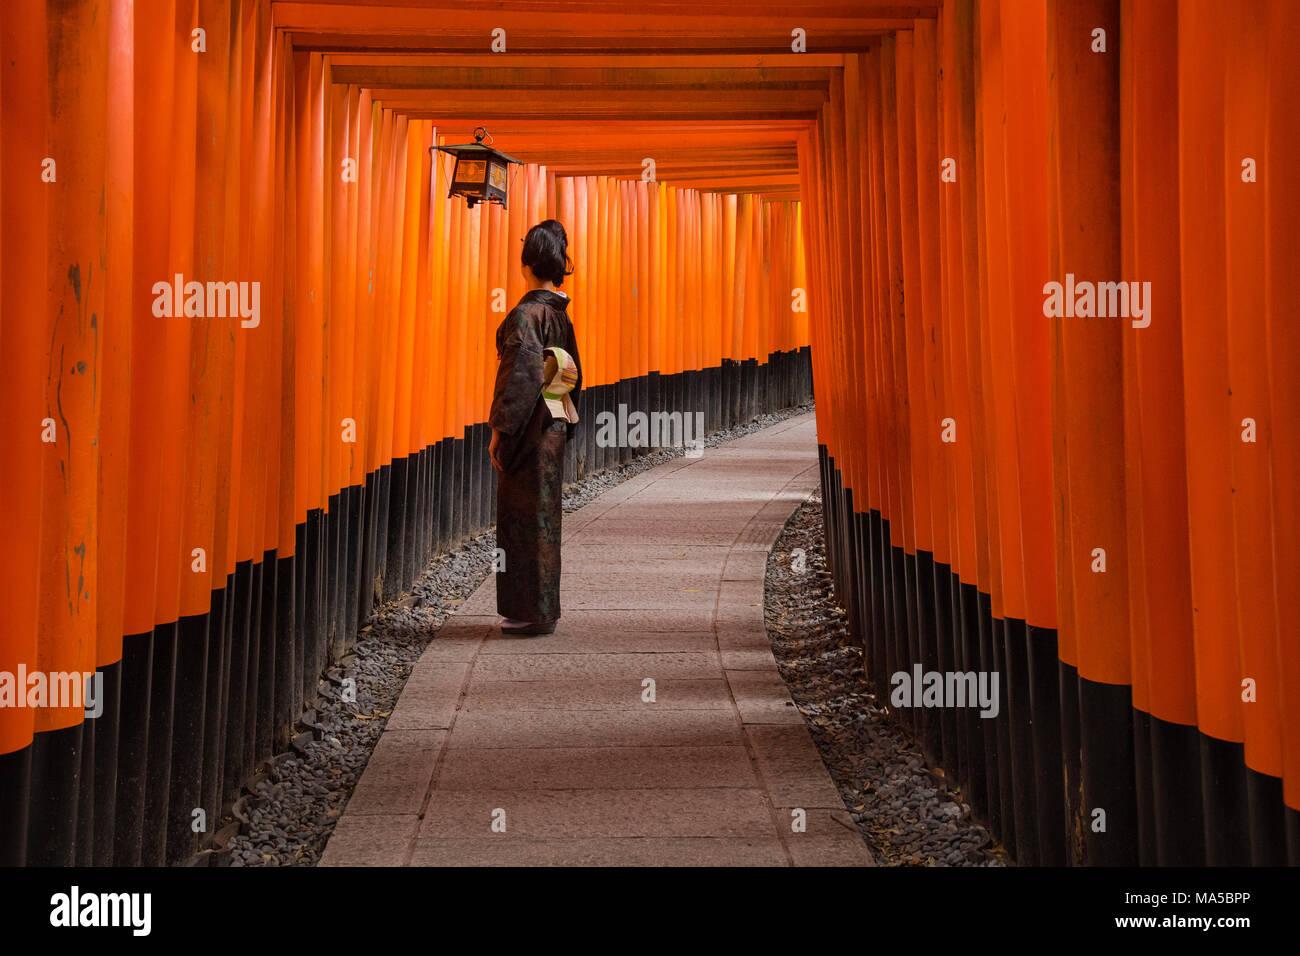 Asien, Japan, Nihon, Nippon, Kyoto, senbon Torii Fushimi Inari Taisha Shrine Stockbild